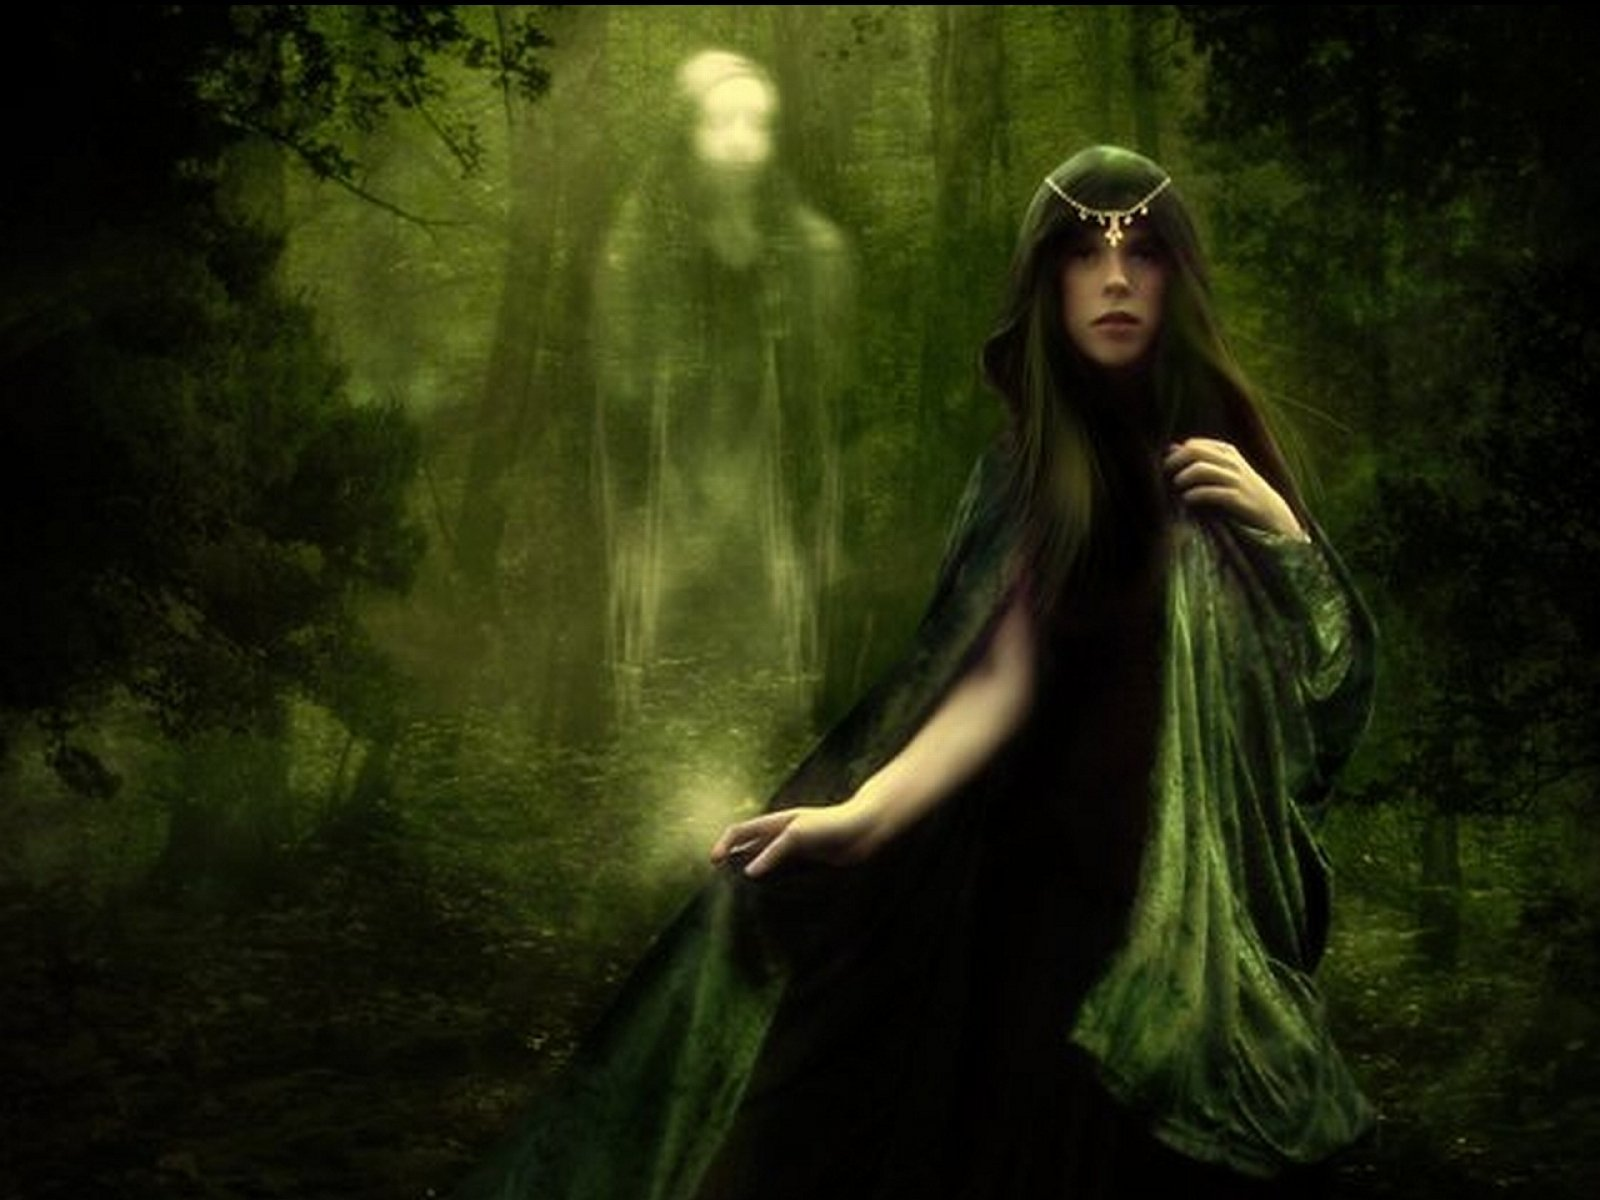 ... ghost fantasy art artwork horror spooky creepy halloween gothic witch